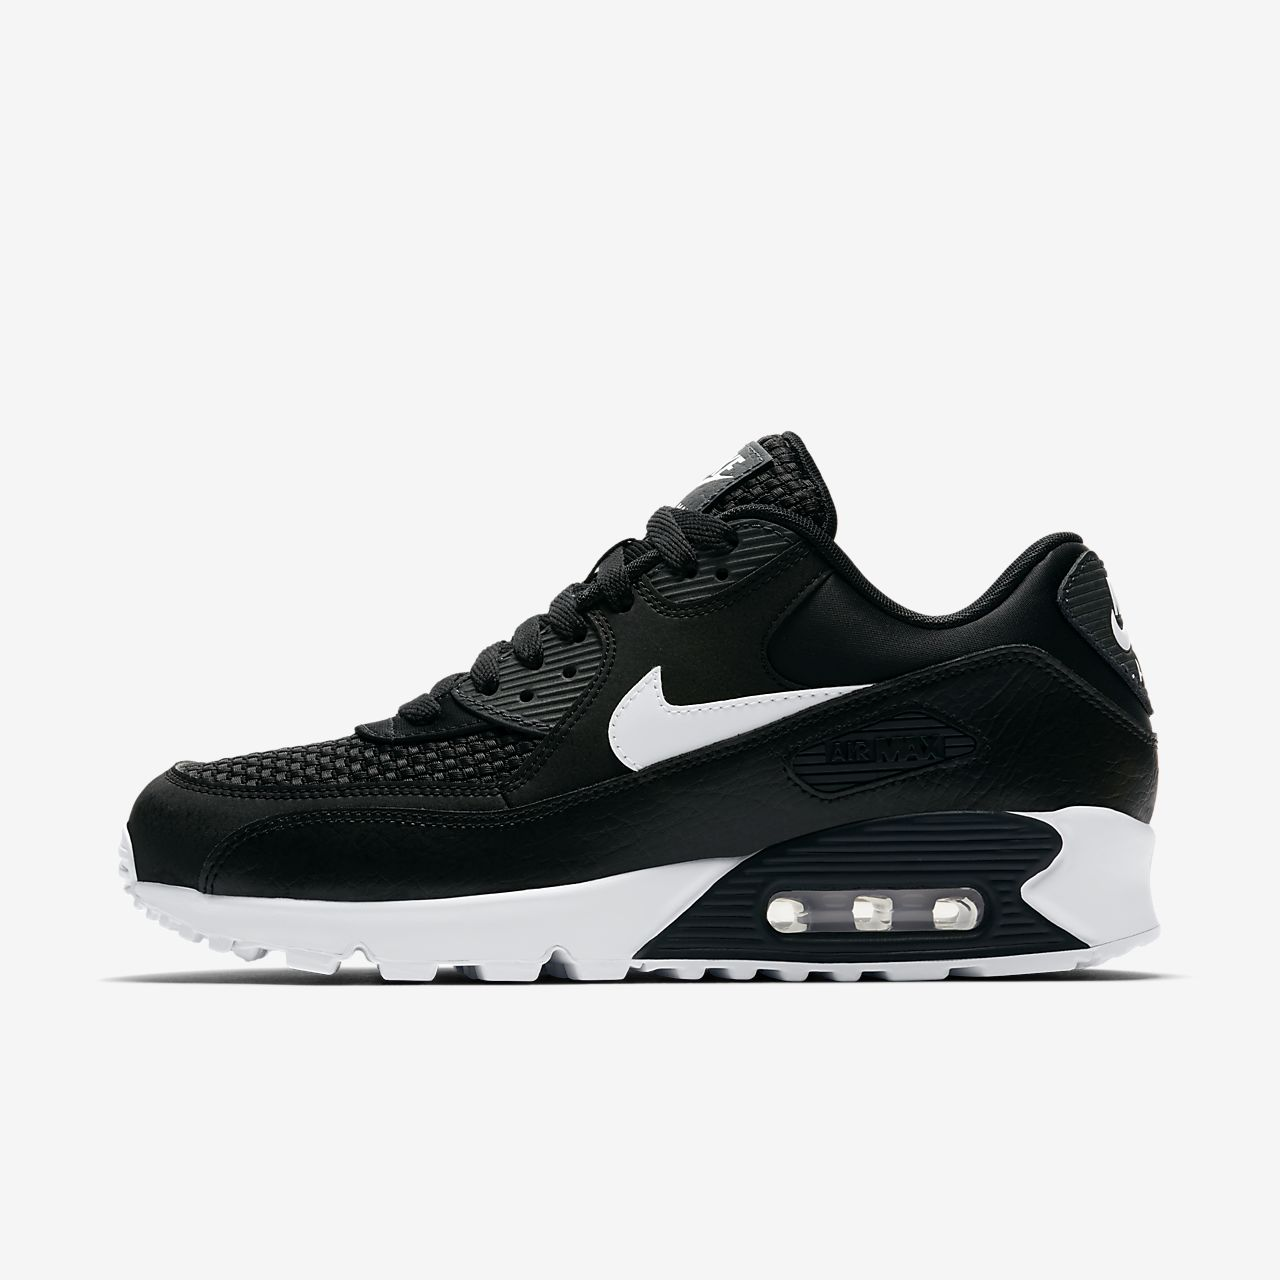 ... Chaussure Nike Air Max 90 SE pour Femme